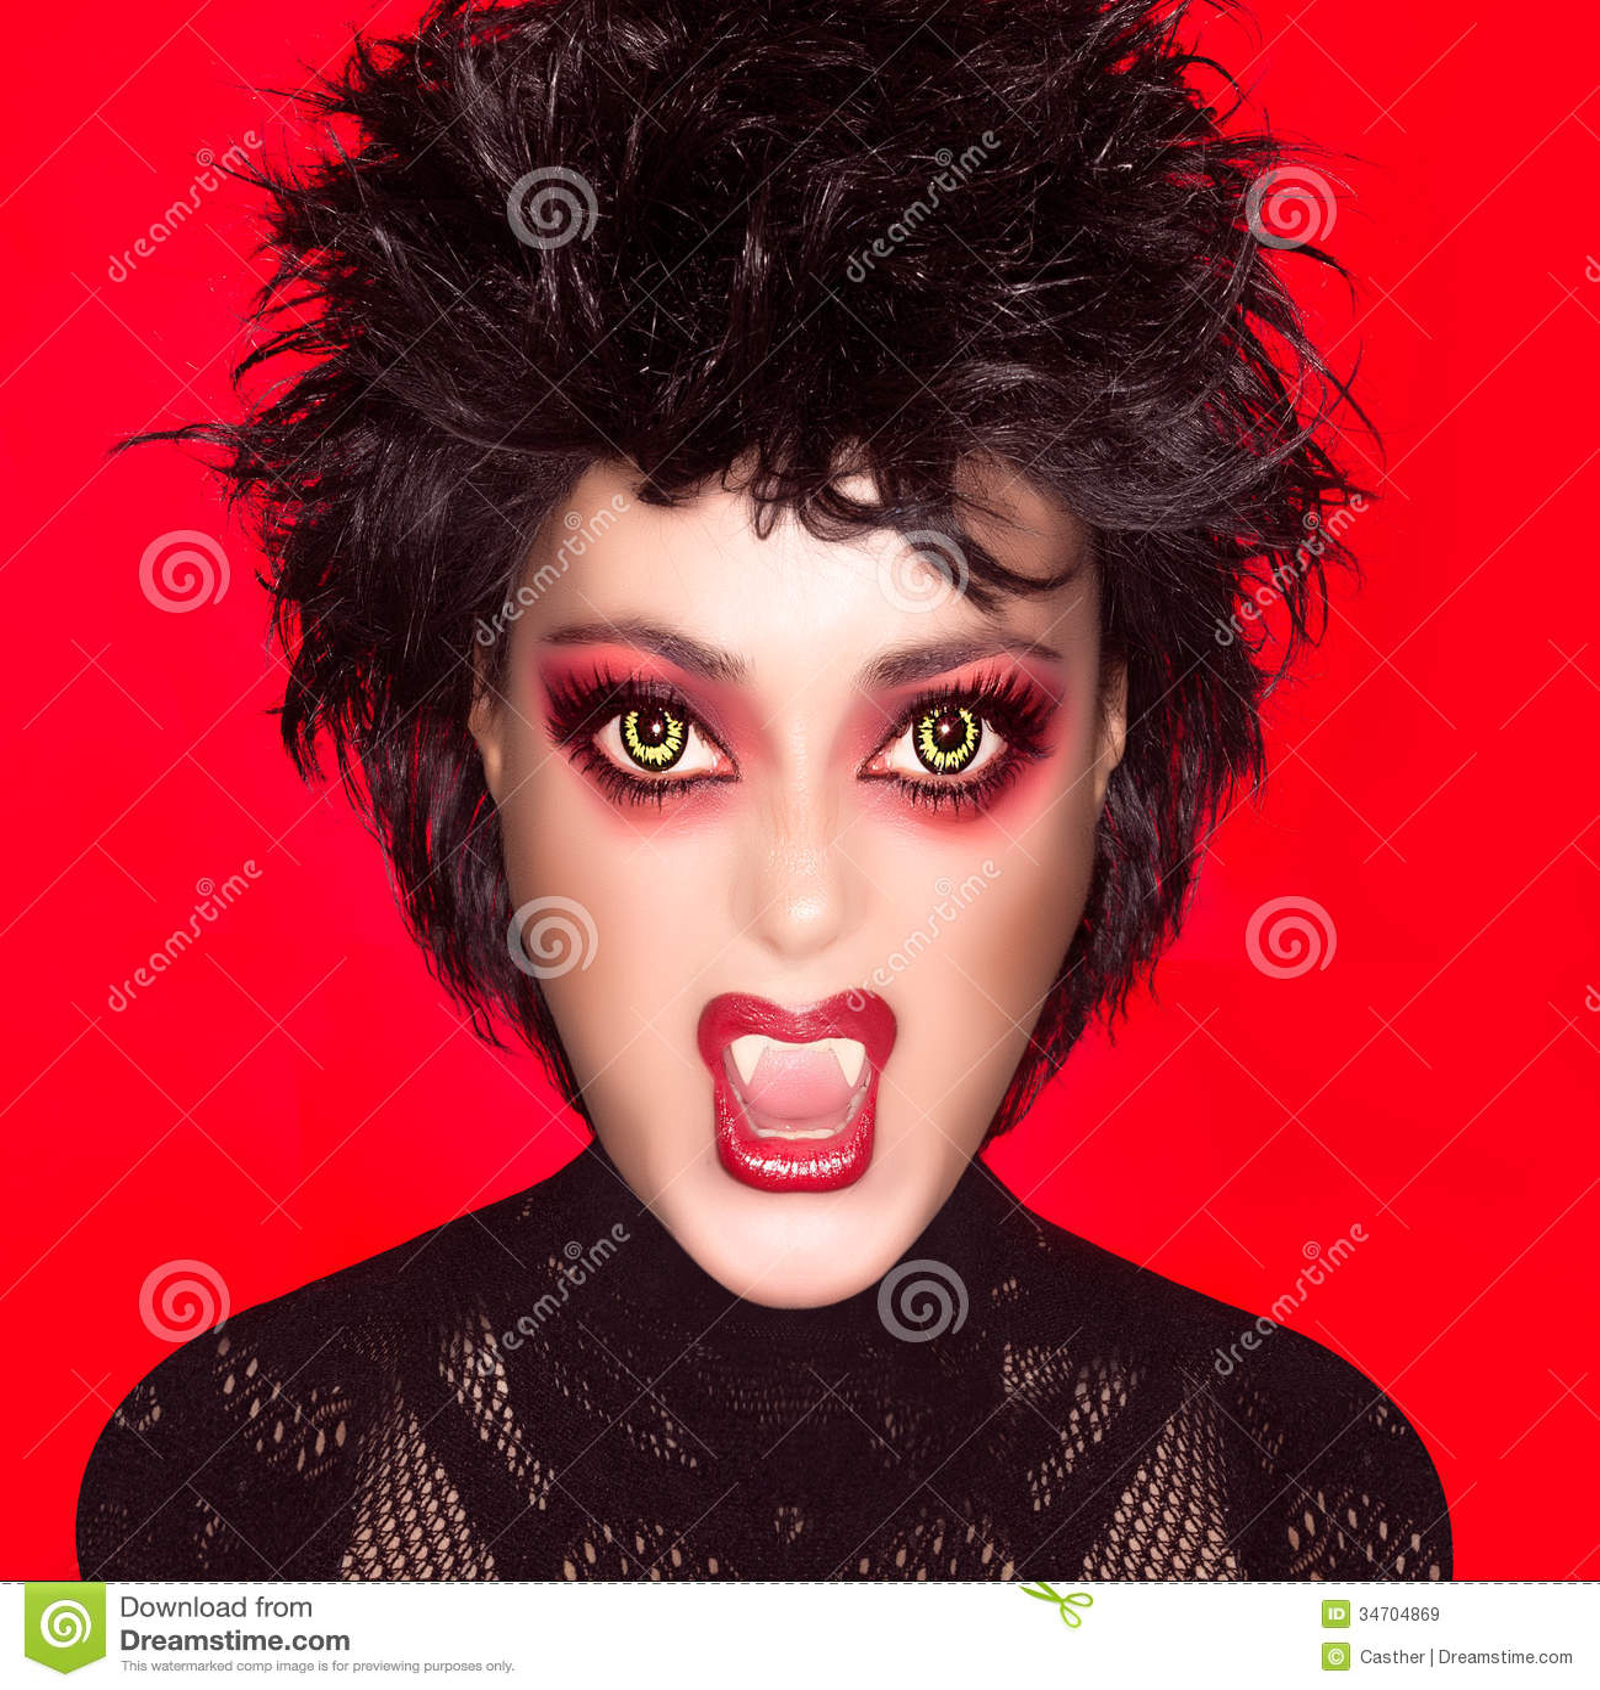 belle fille gothique maquillage de vampire caricature. Black Bedroom Furniture Sets. Home Design Ideas